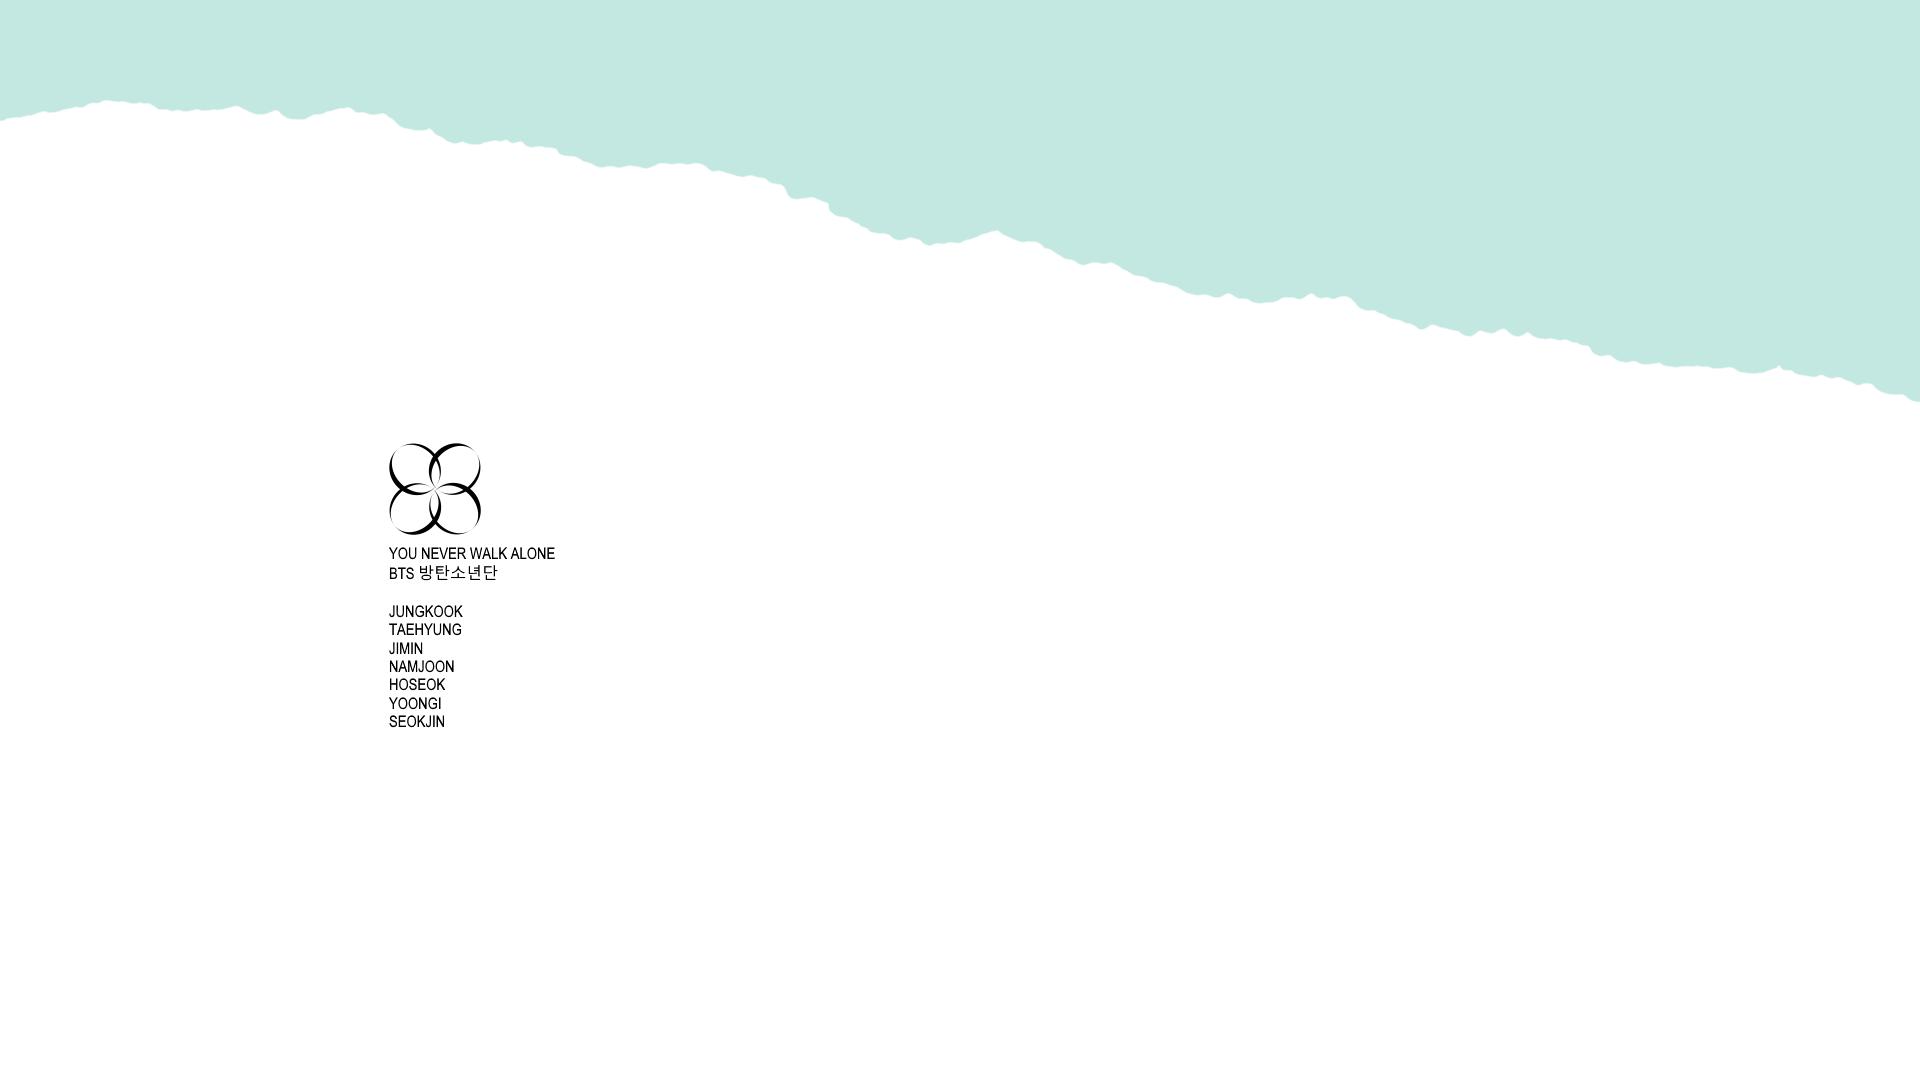 desktop wallpaper tumblr,white,text,font,line,sky